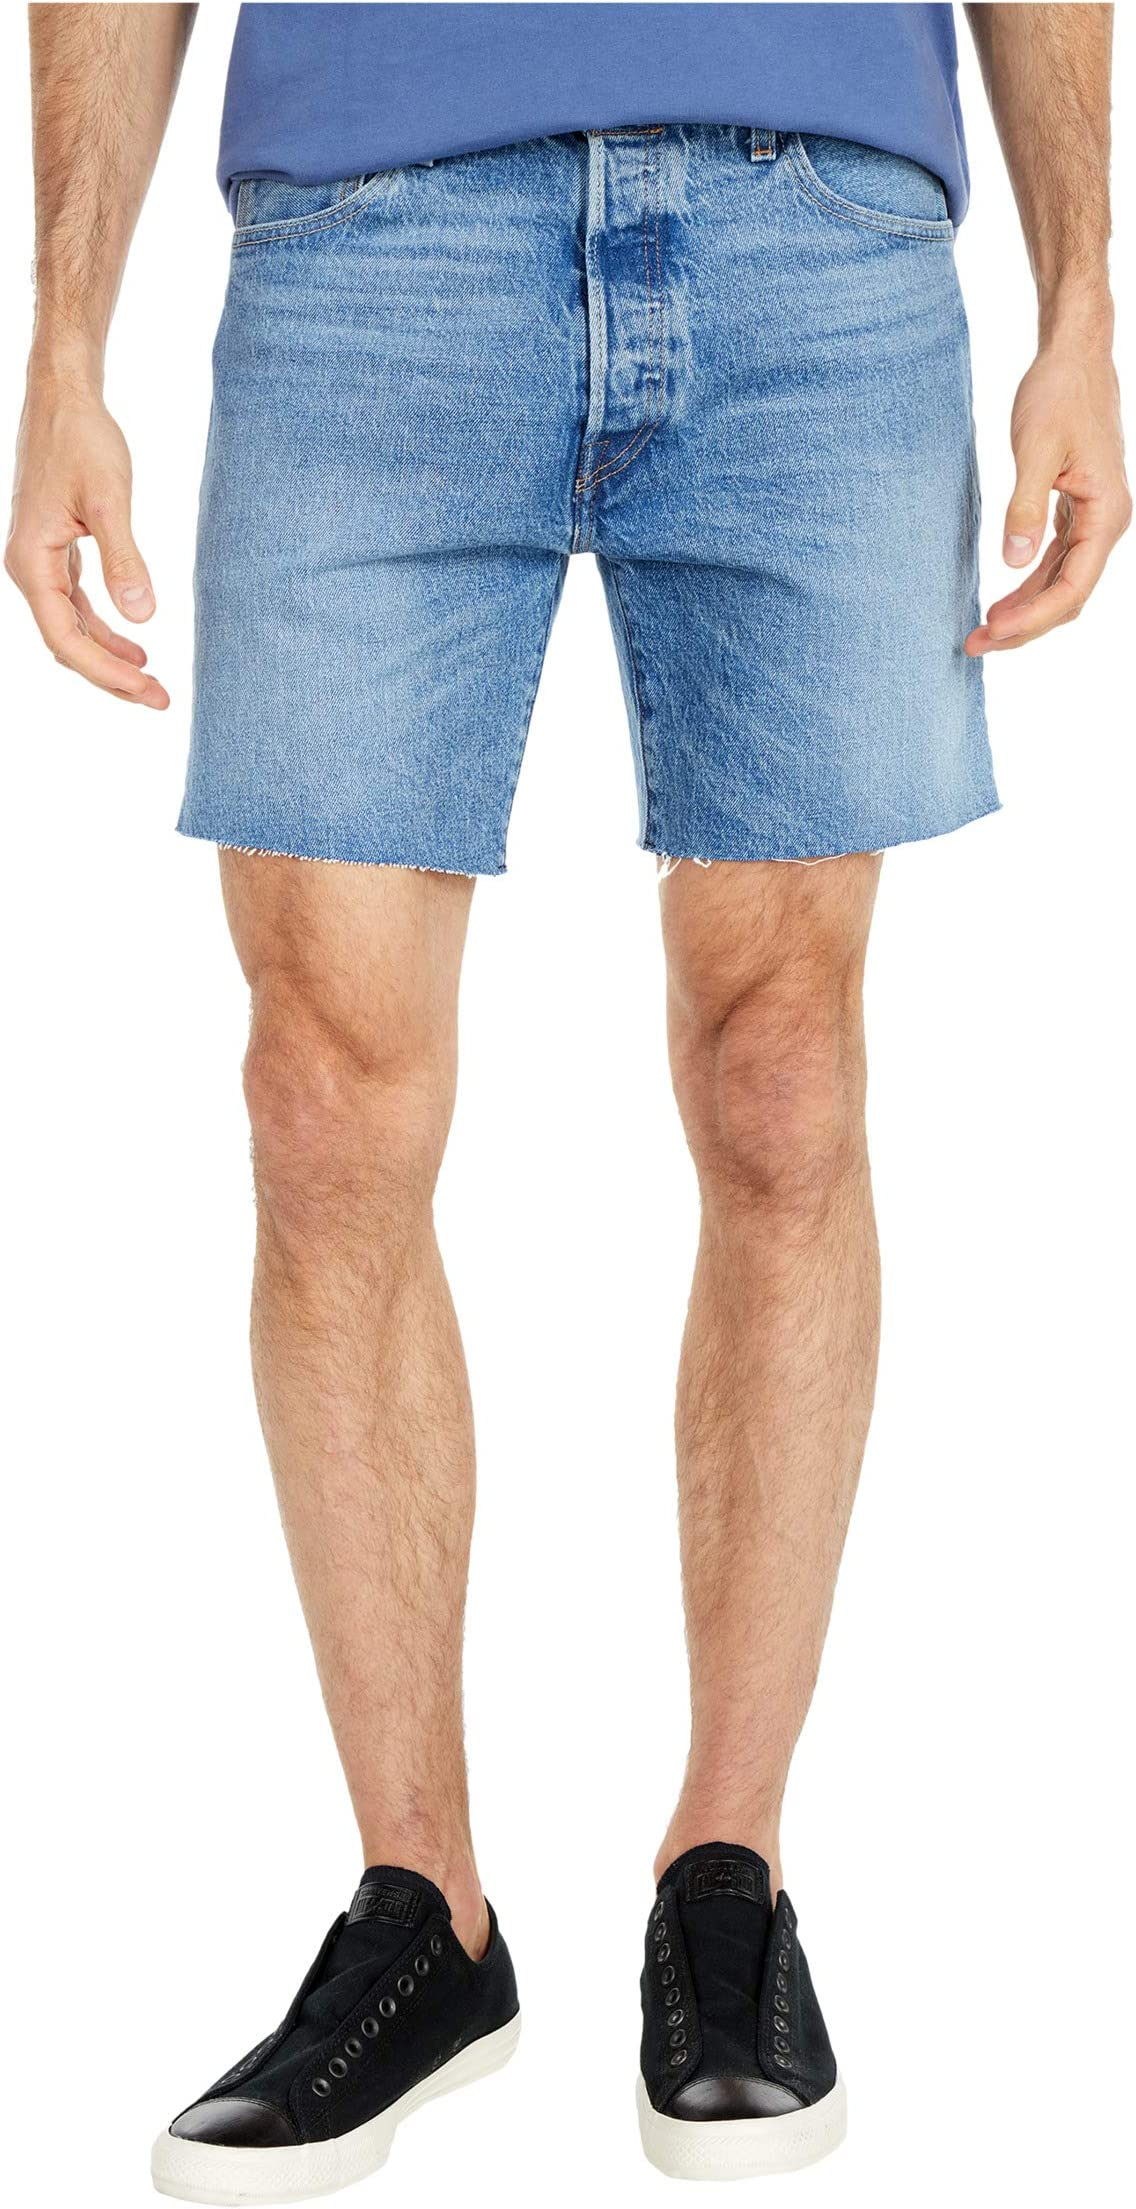 Levi's® Premium Levi's® 501 '93 Cut Shorts